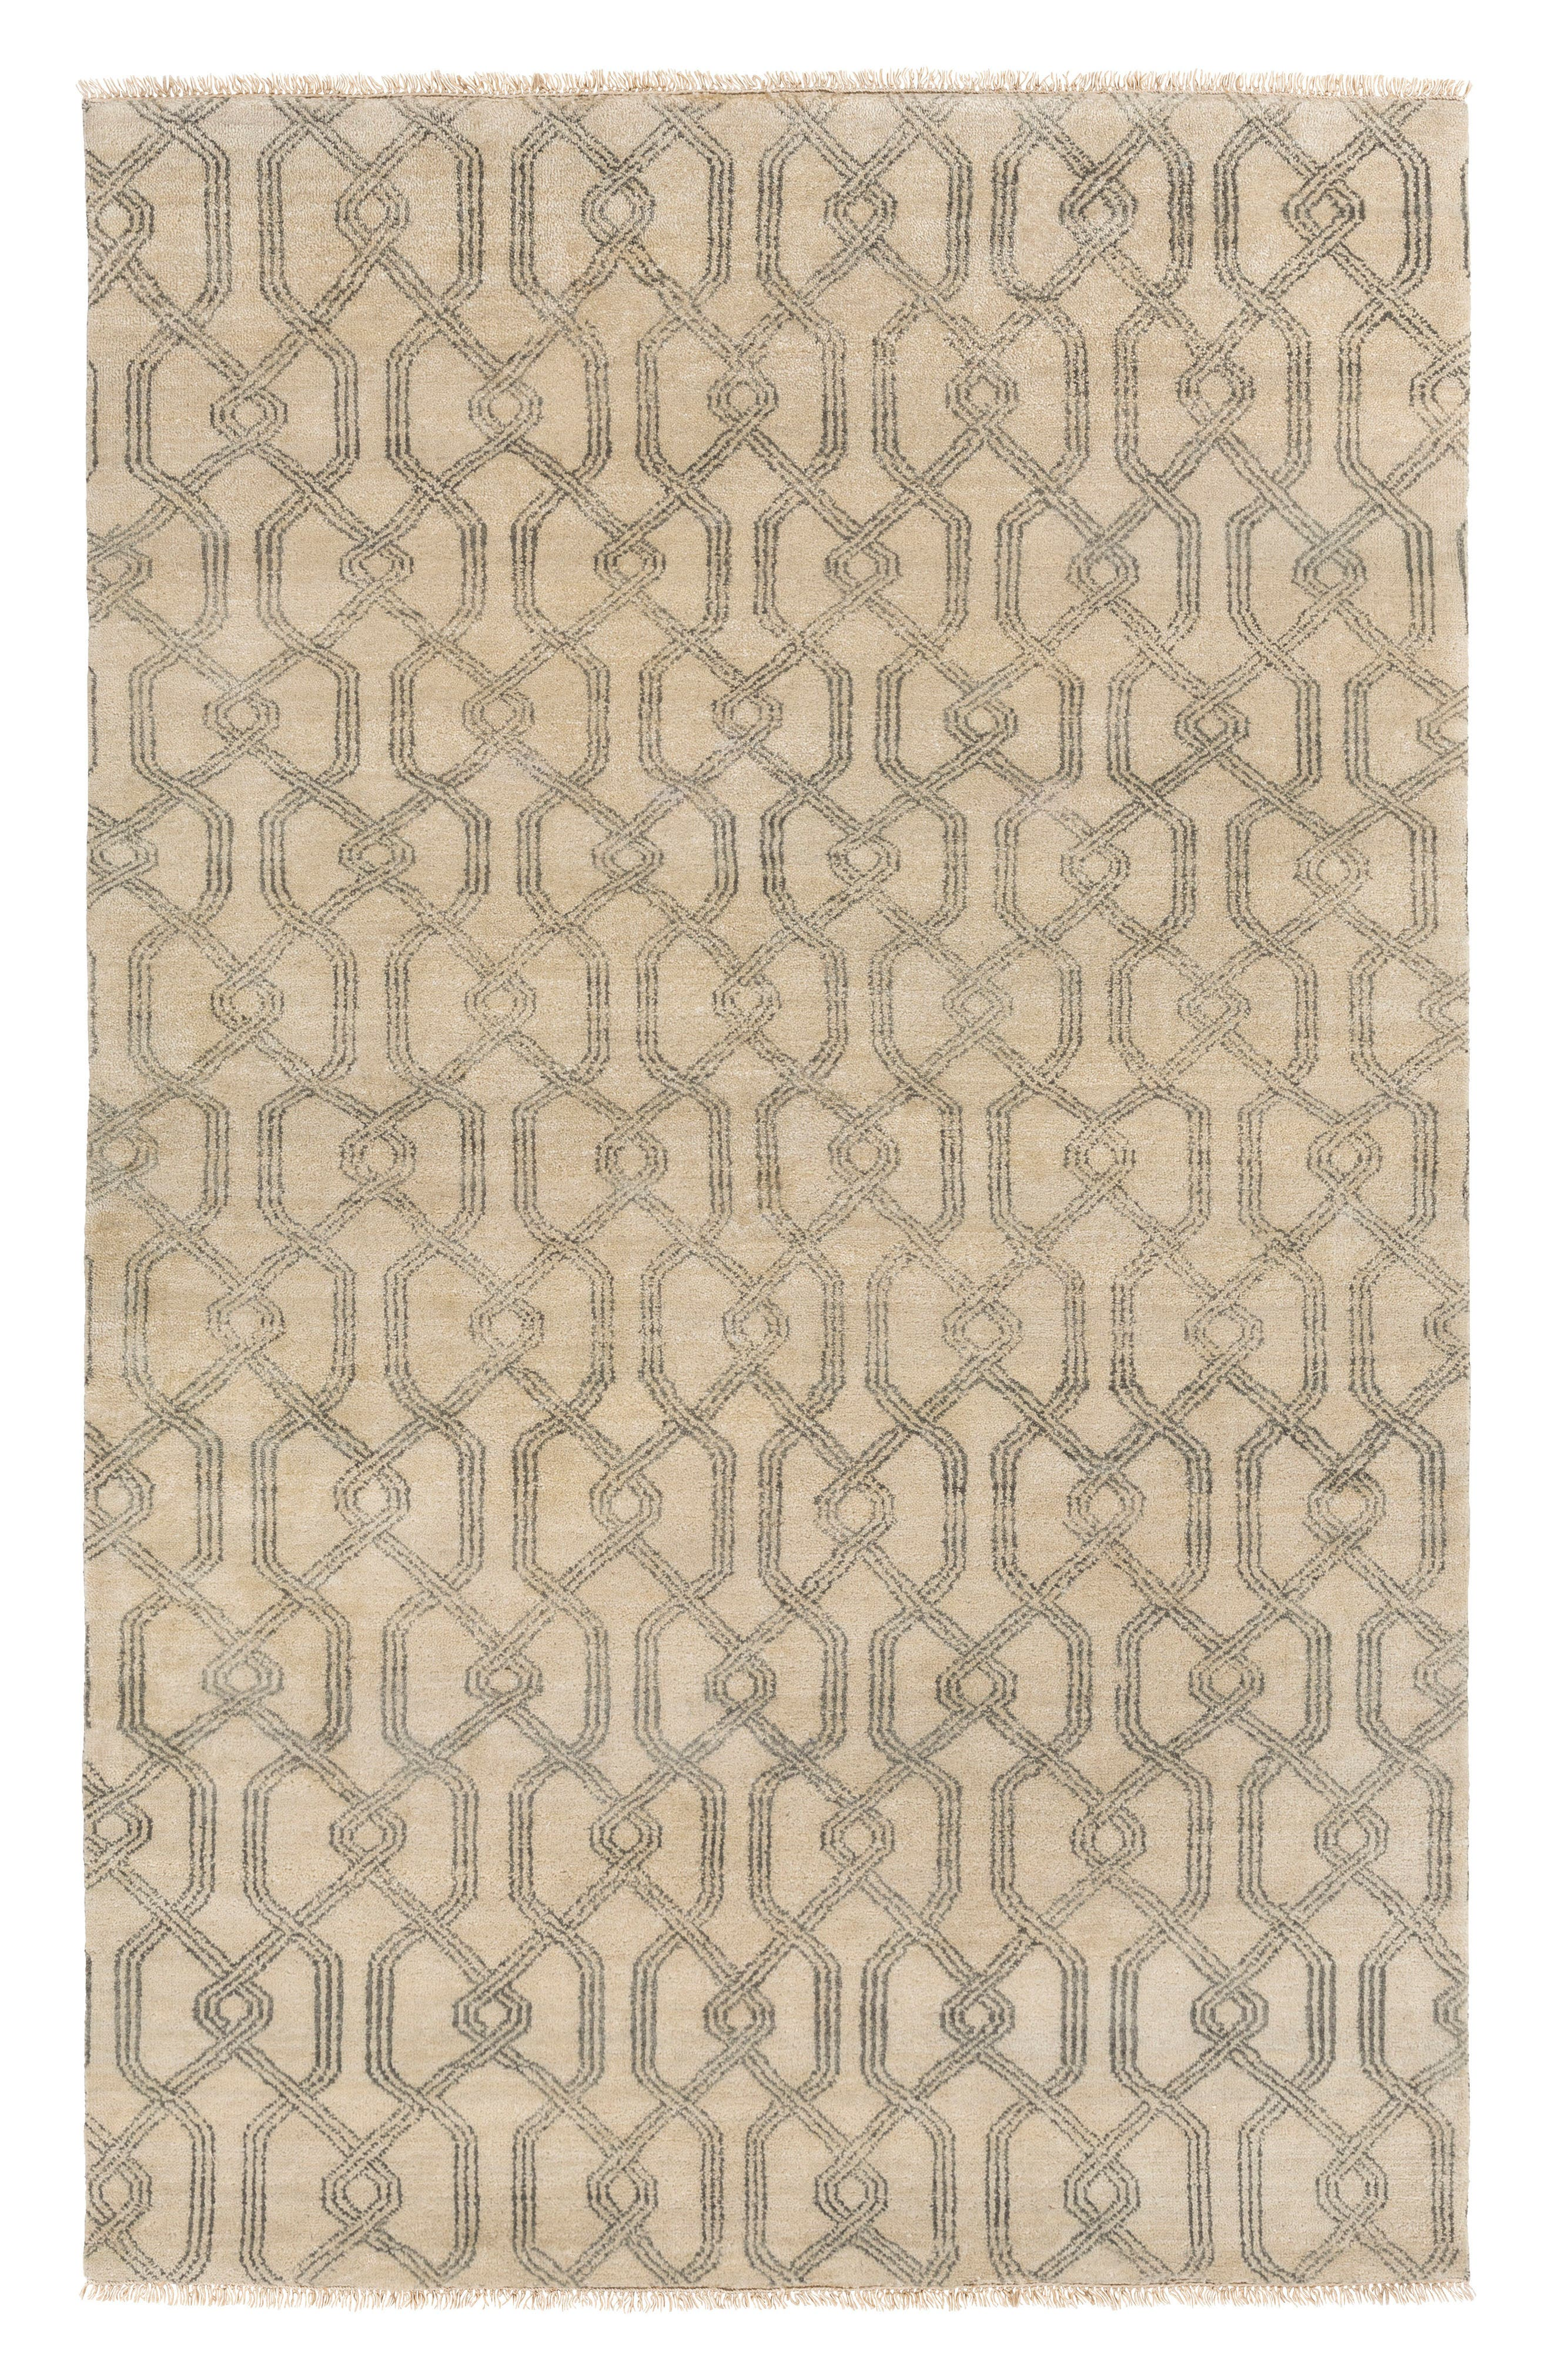 'Stanton' Wool & Cotton Rug,                             Alternate thumbnail 2, color,                             020